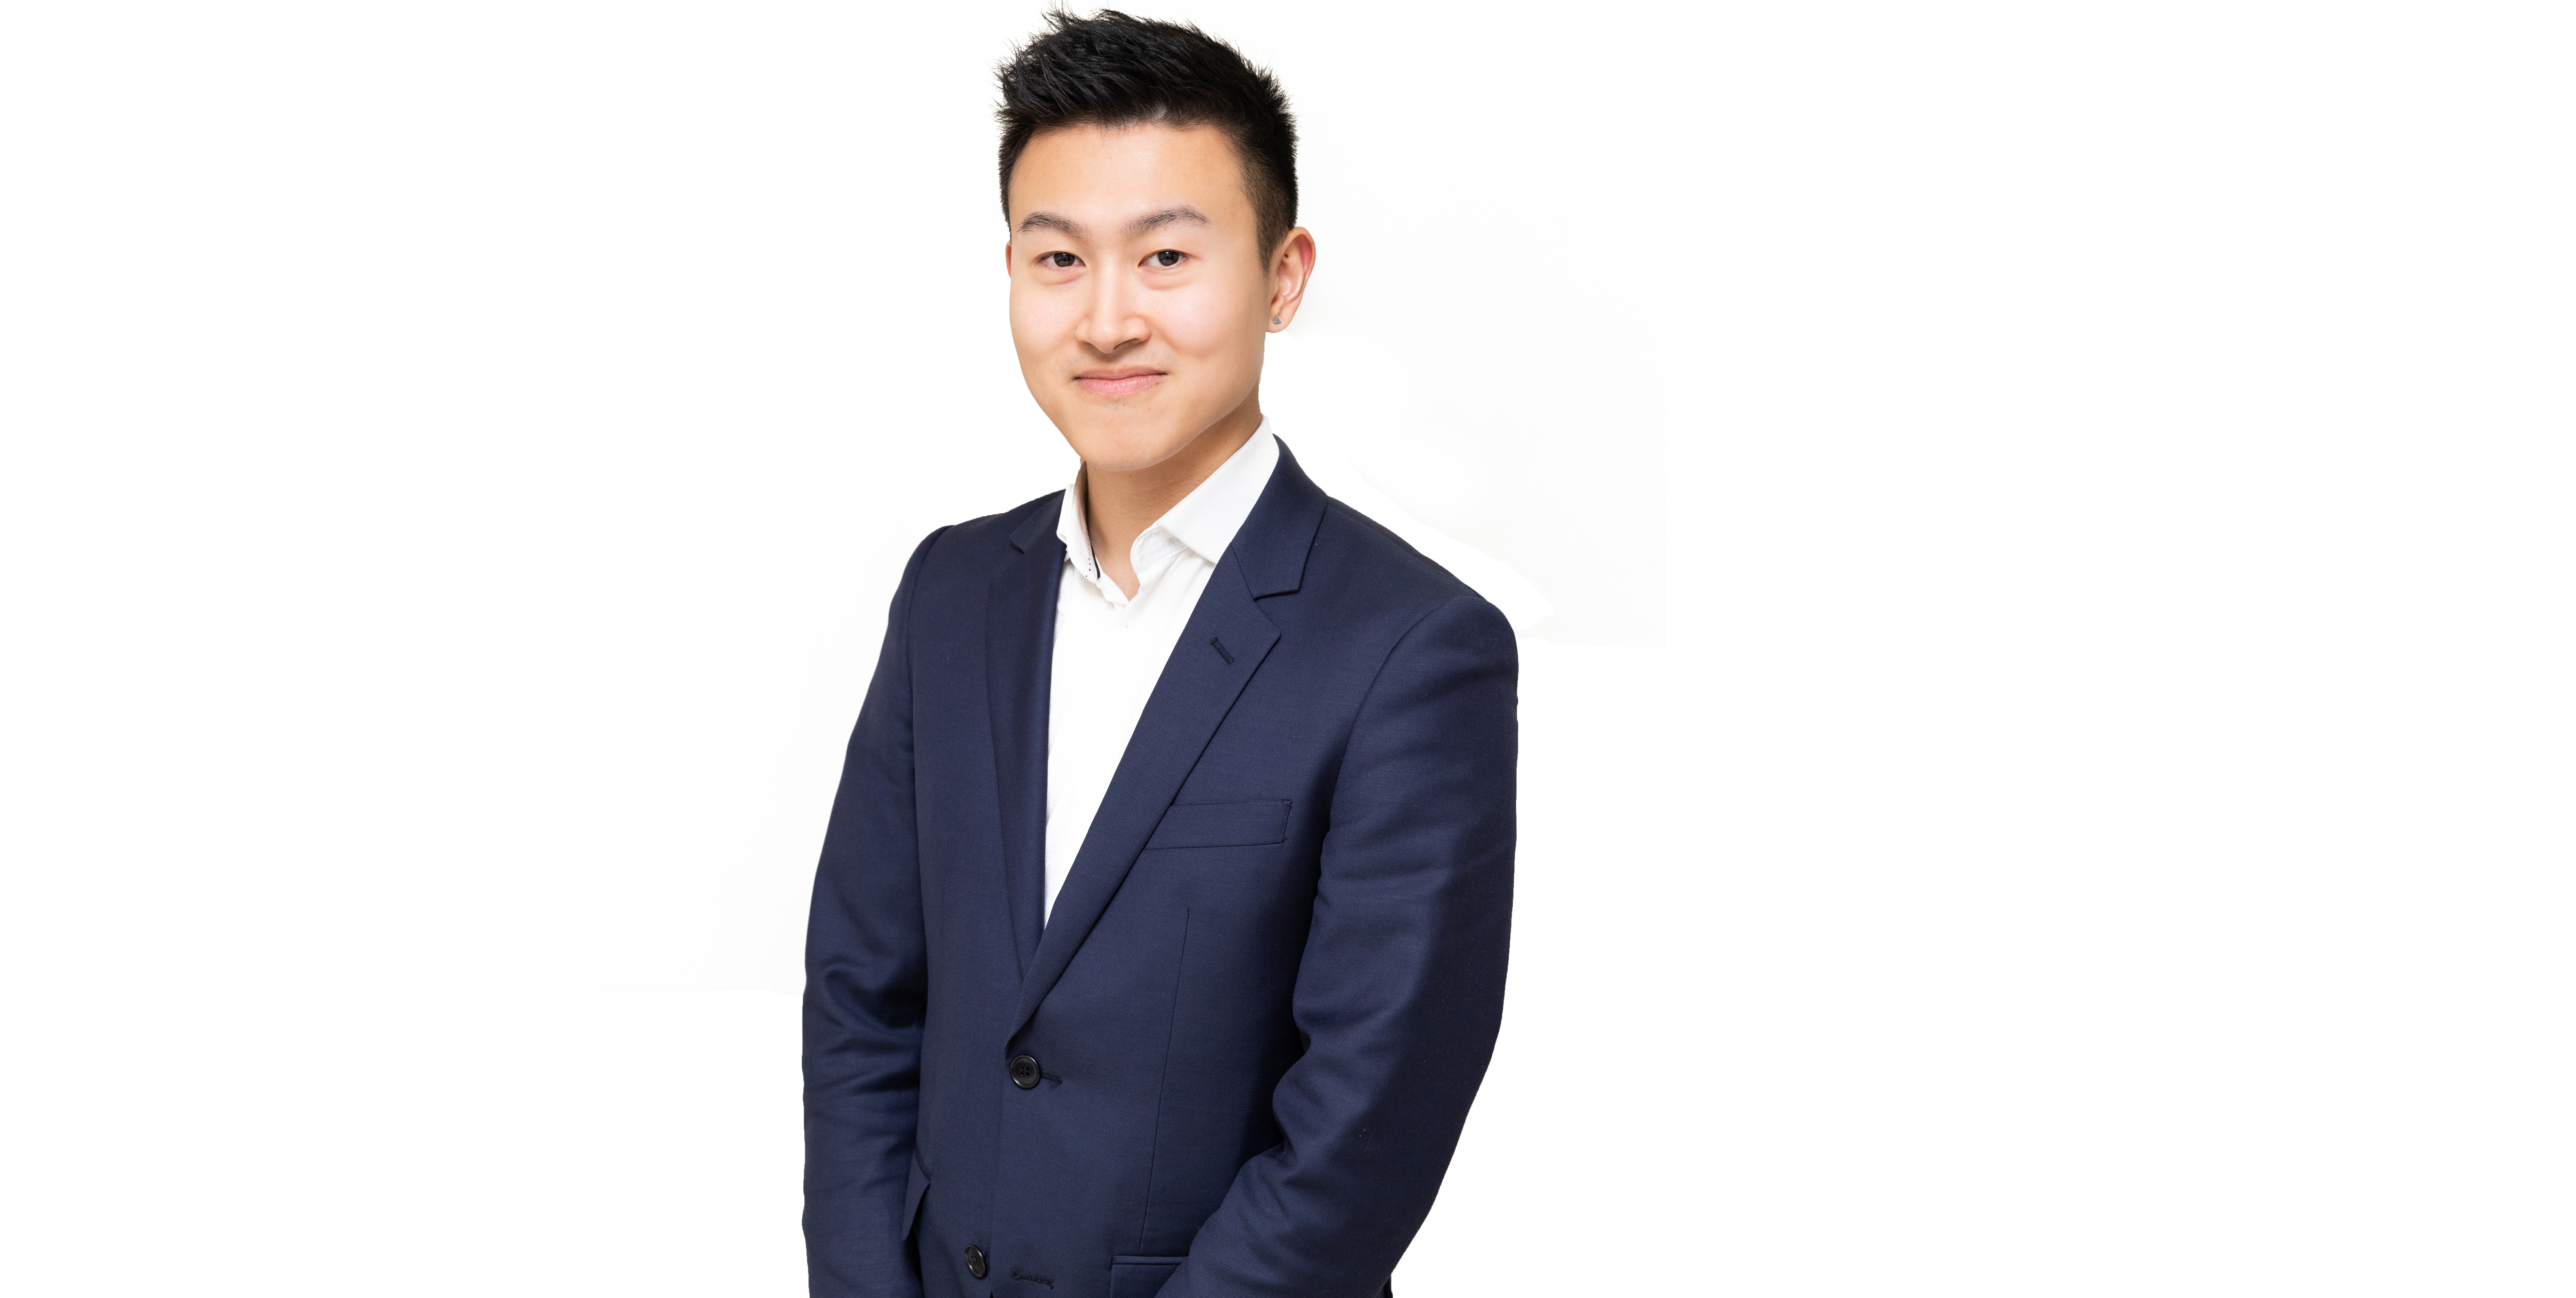 Henry Hua